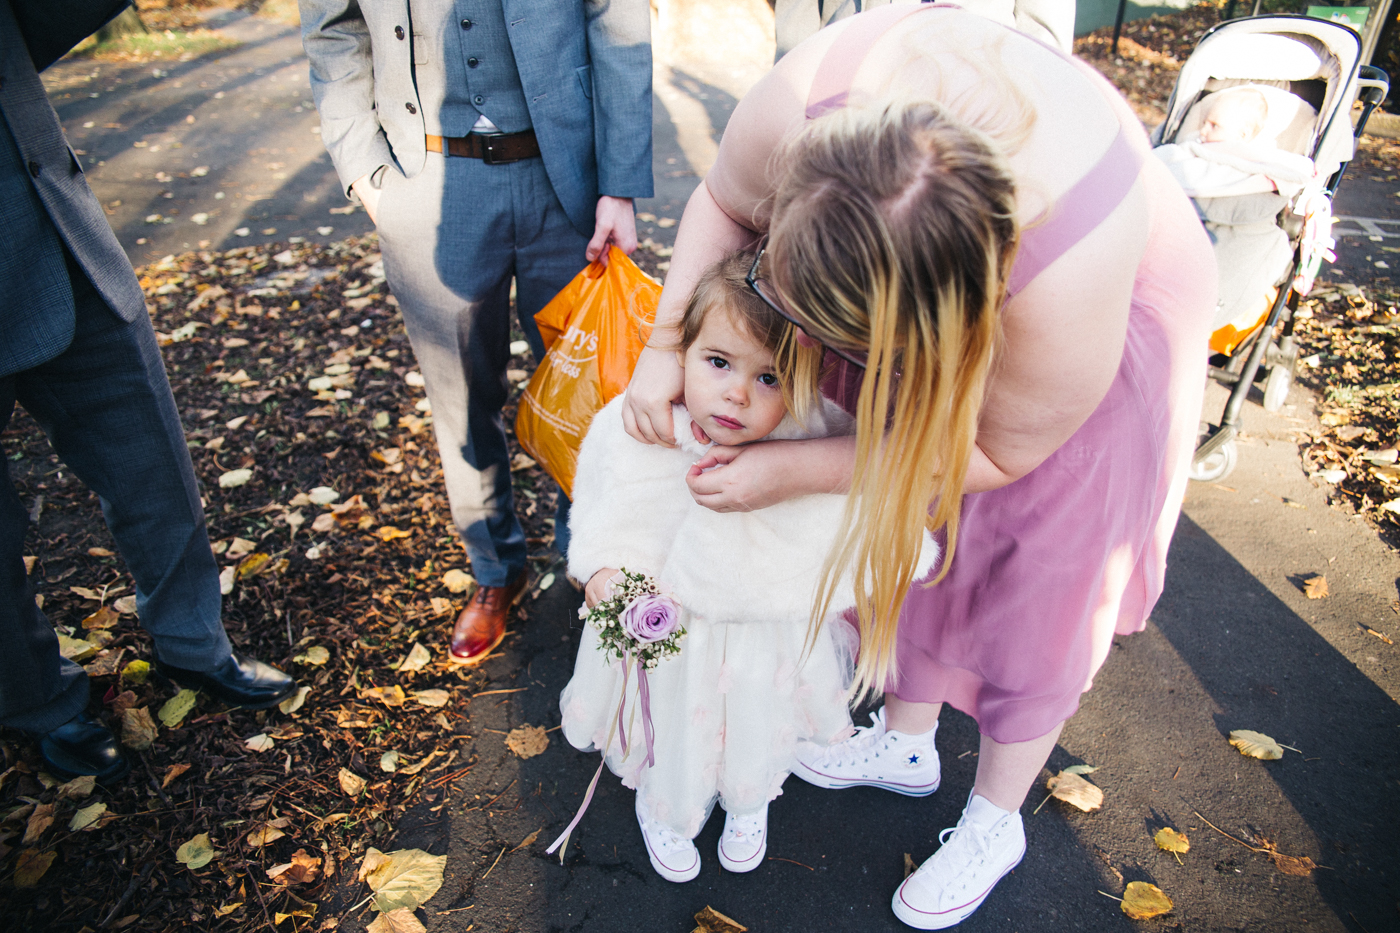 teesside-newcastle-gateshead-wedding-photography-photographer-creative-0044.jpg